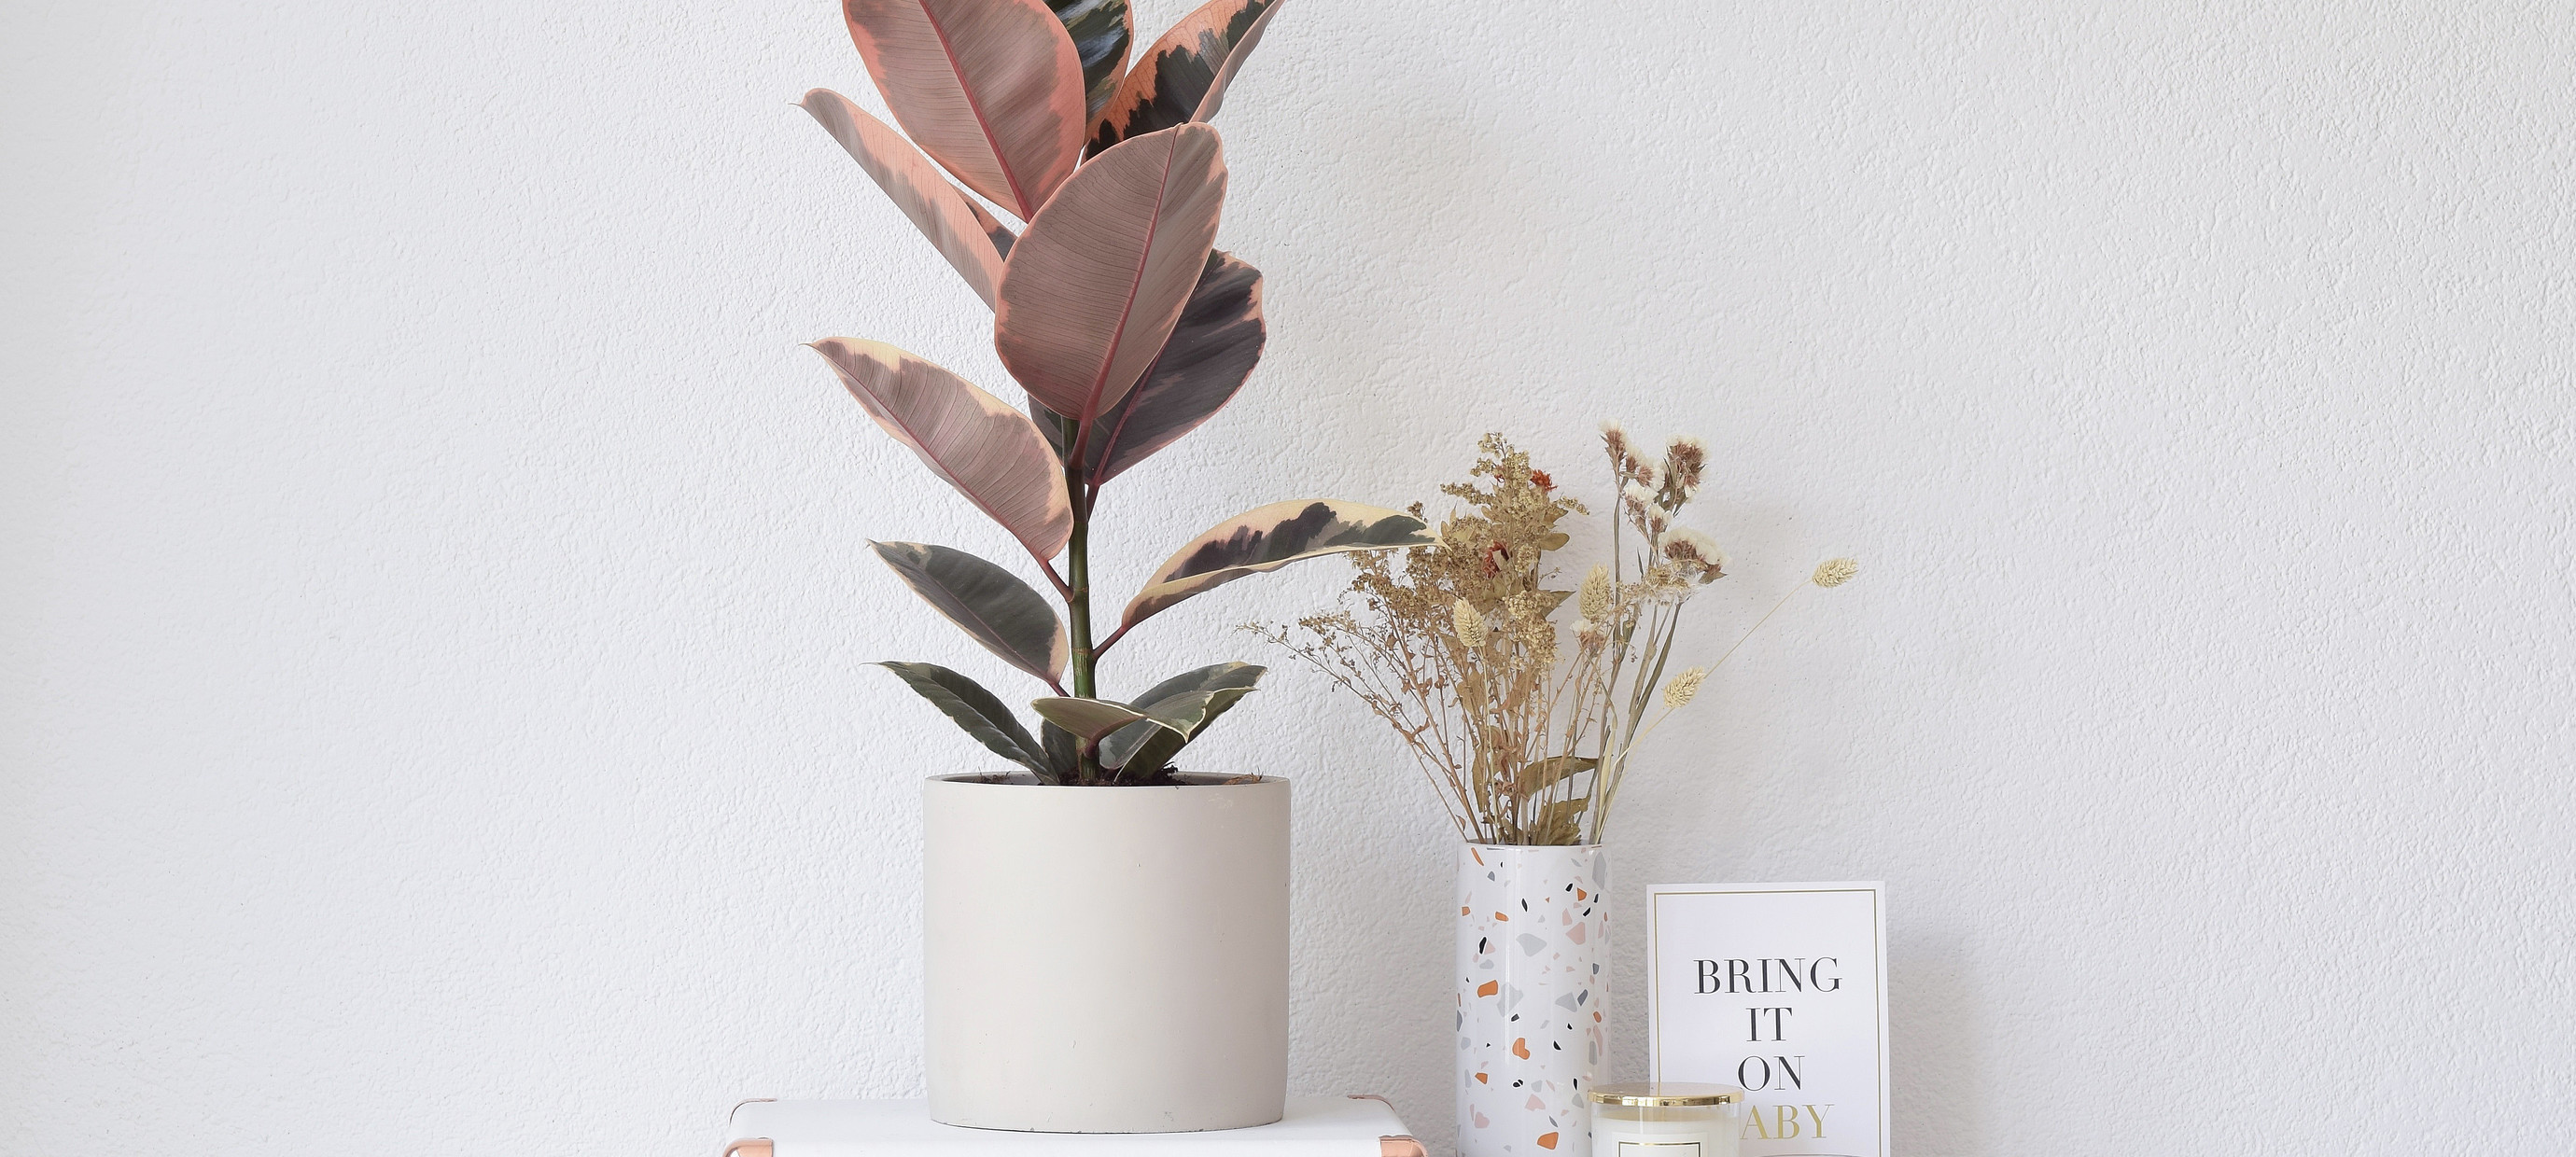 Nieuwe trend: Patterned plants